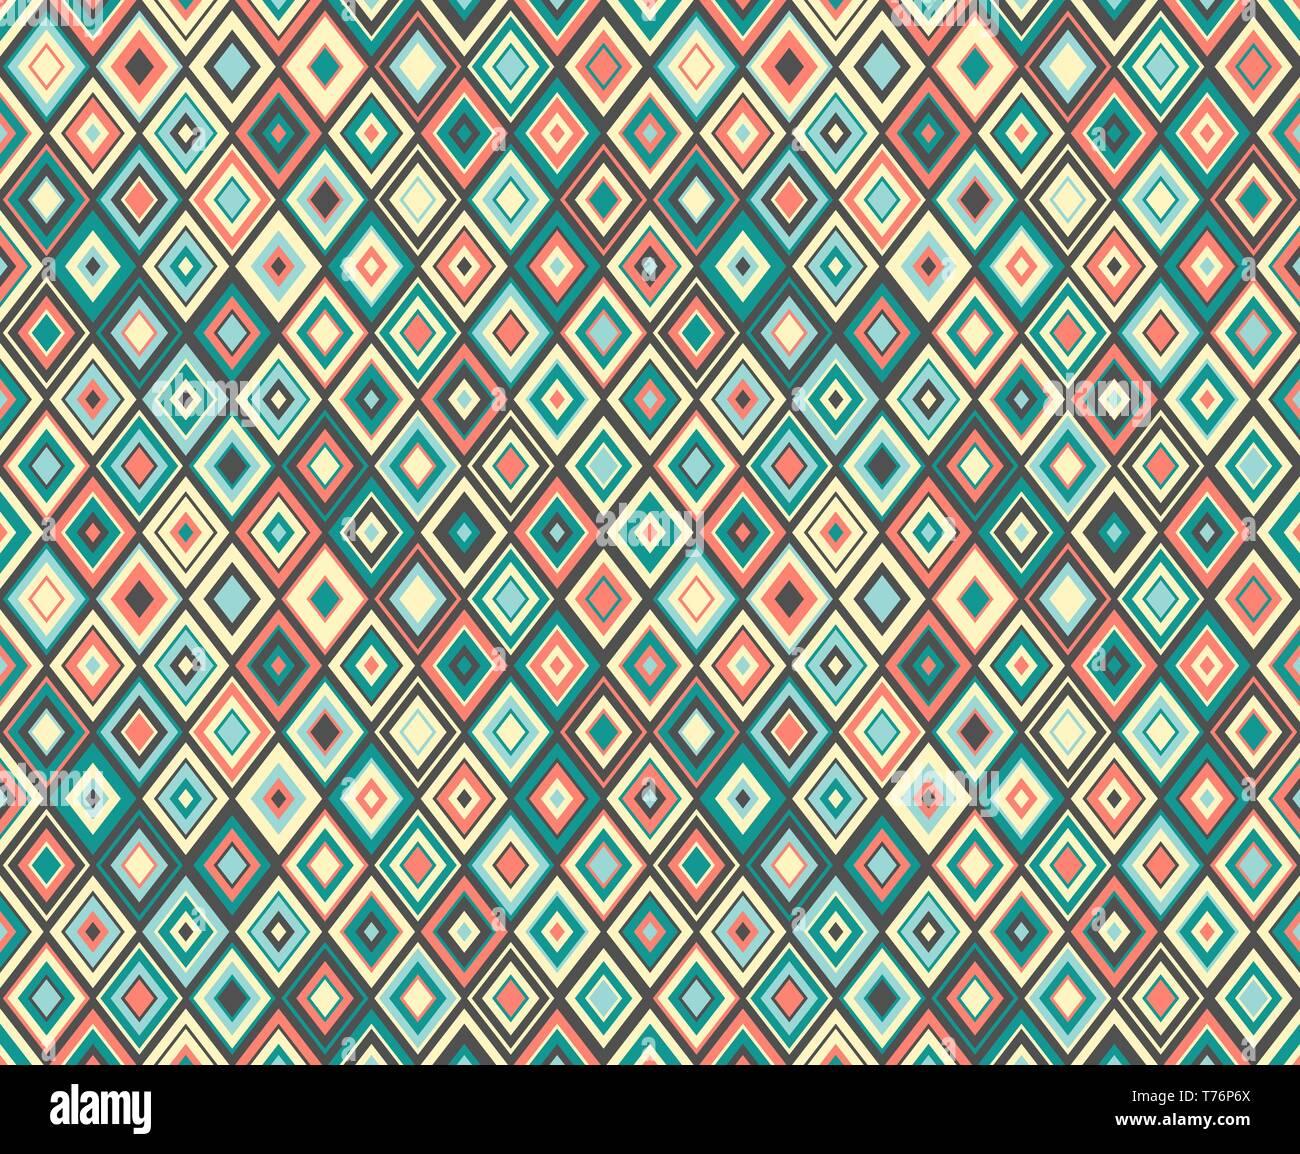 Modern Diamond Geometric Seamless Pattern Texture For